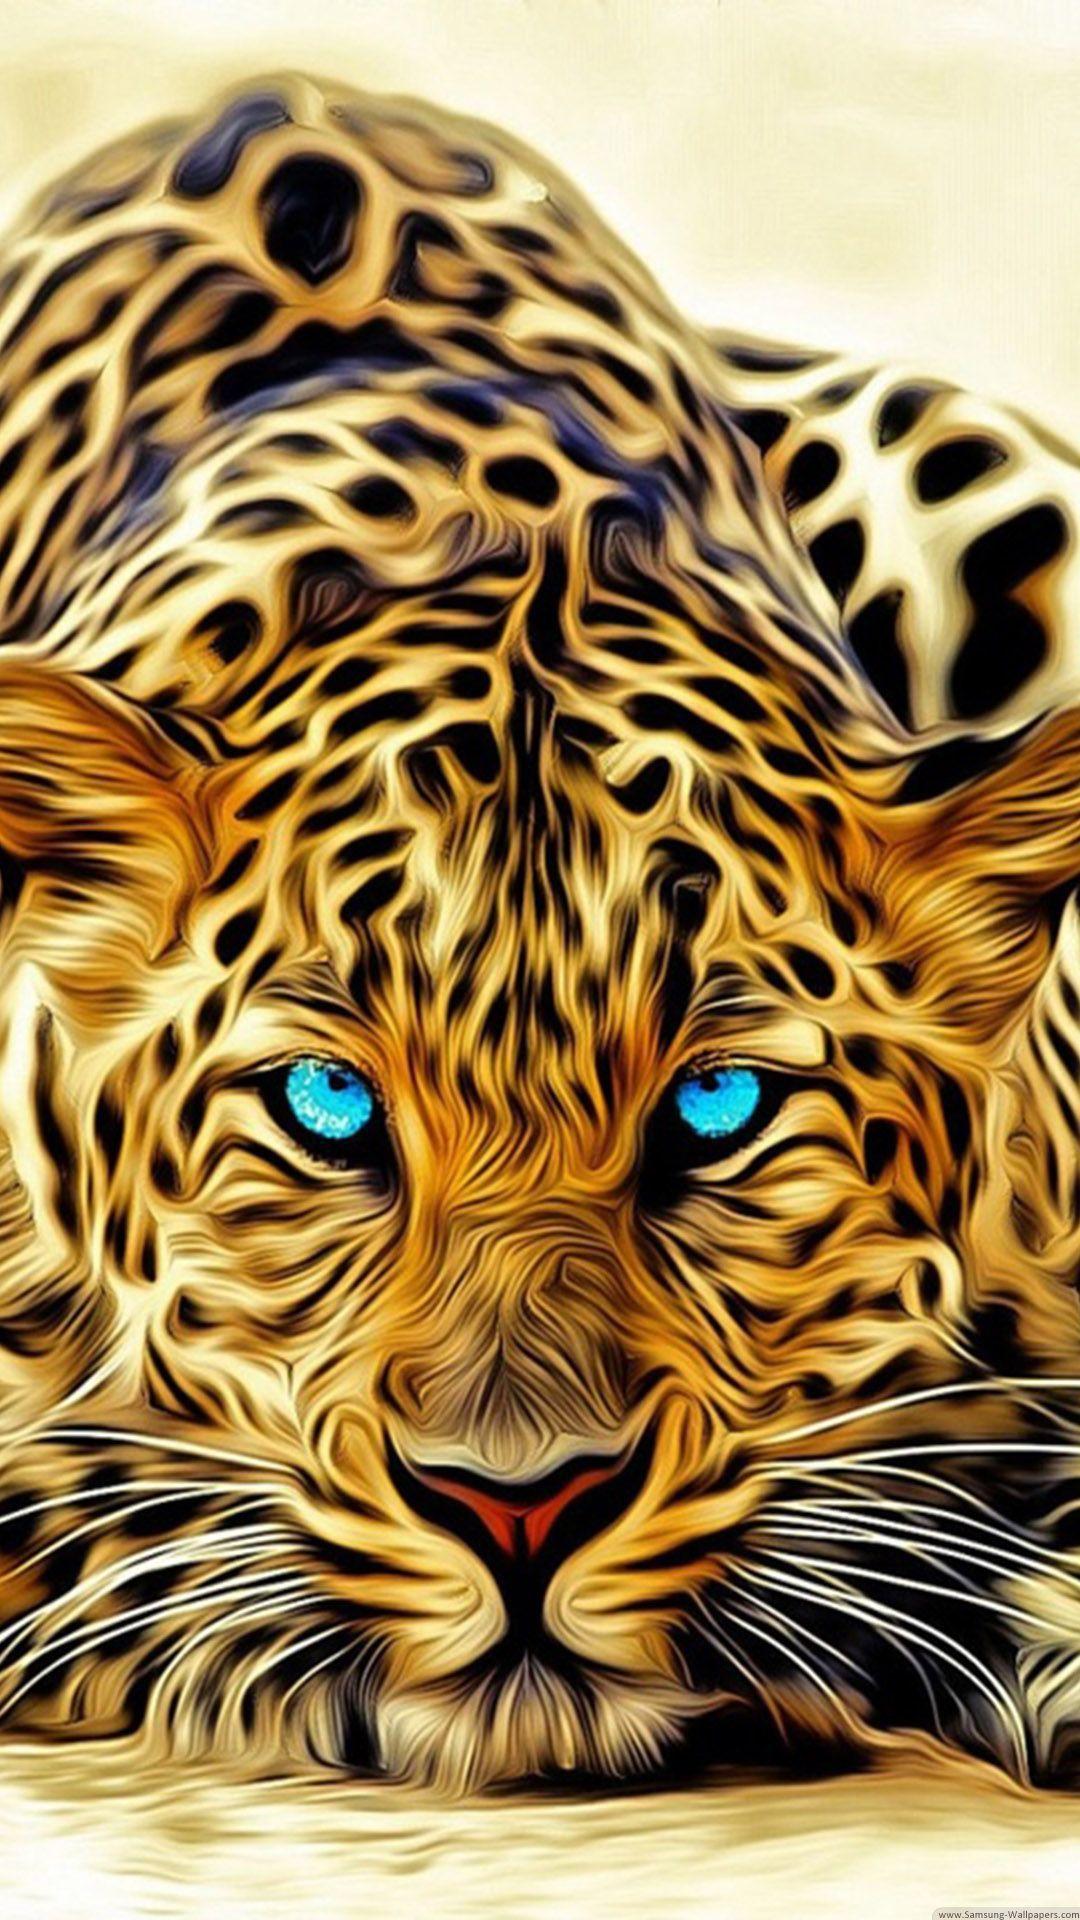 1080x1920 3d Animal Tiger Iphone 6 Hd Images Free Download Iphone Wallpapers Jaguar Wallpaper Animal Wallpaper Big Cats Art